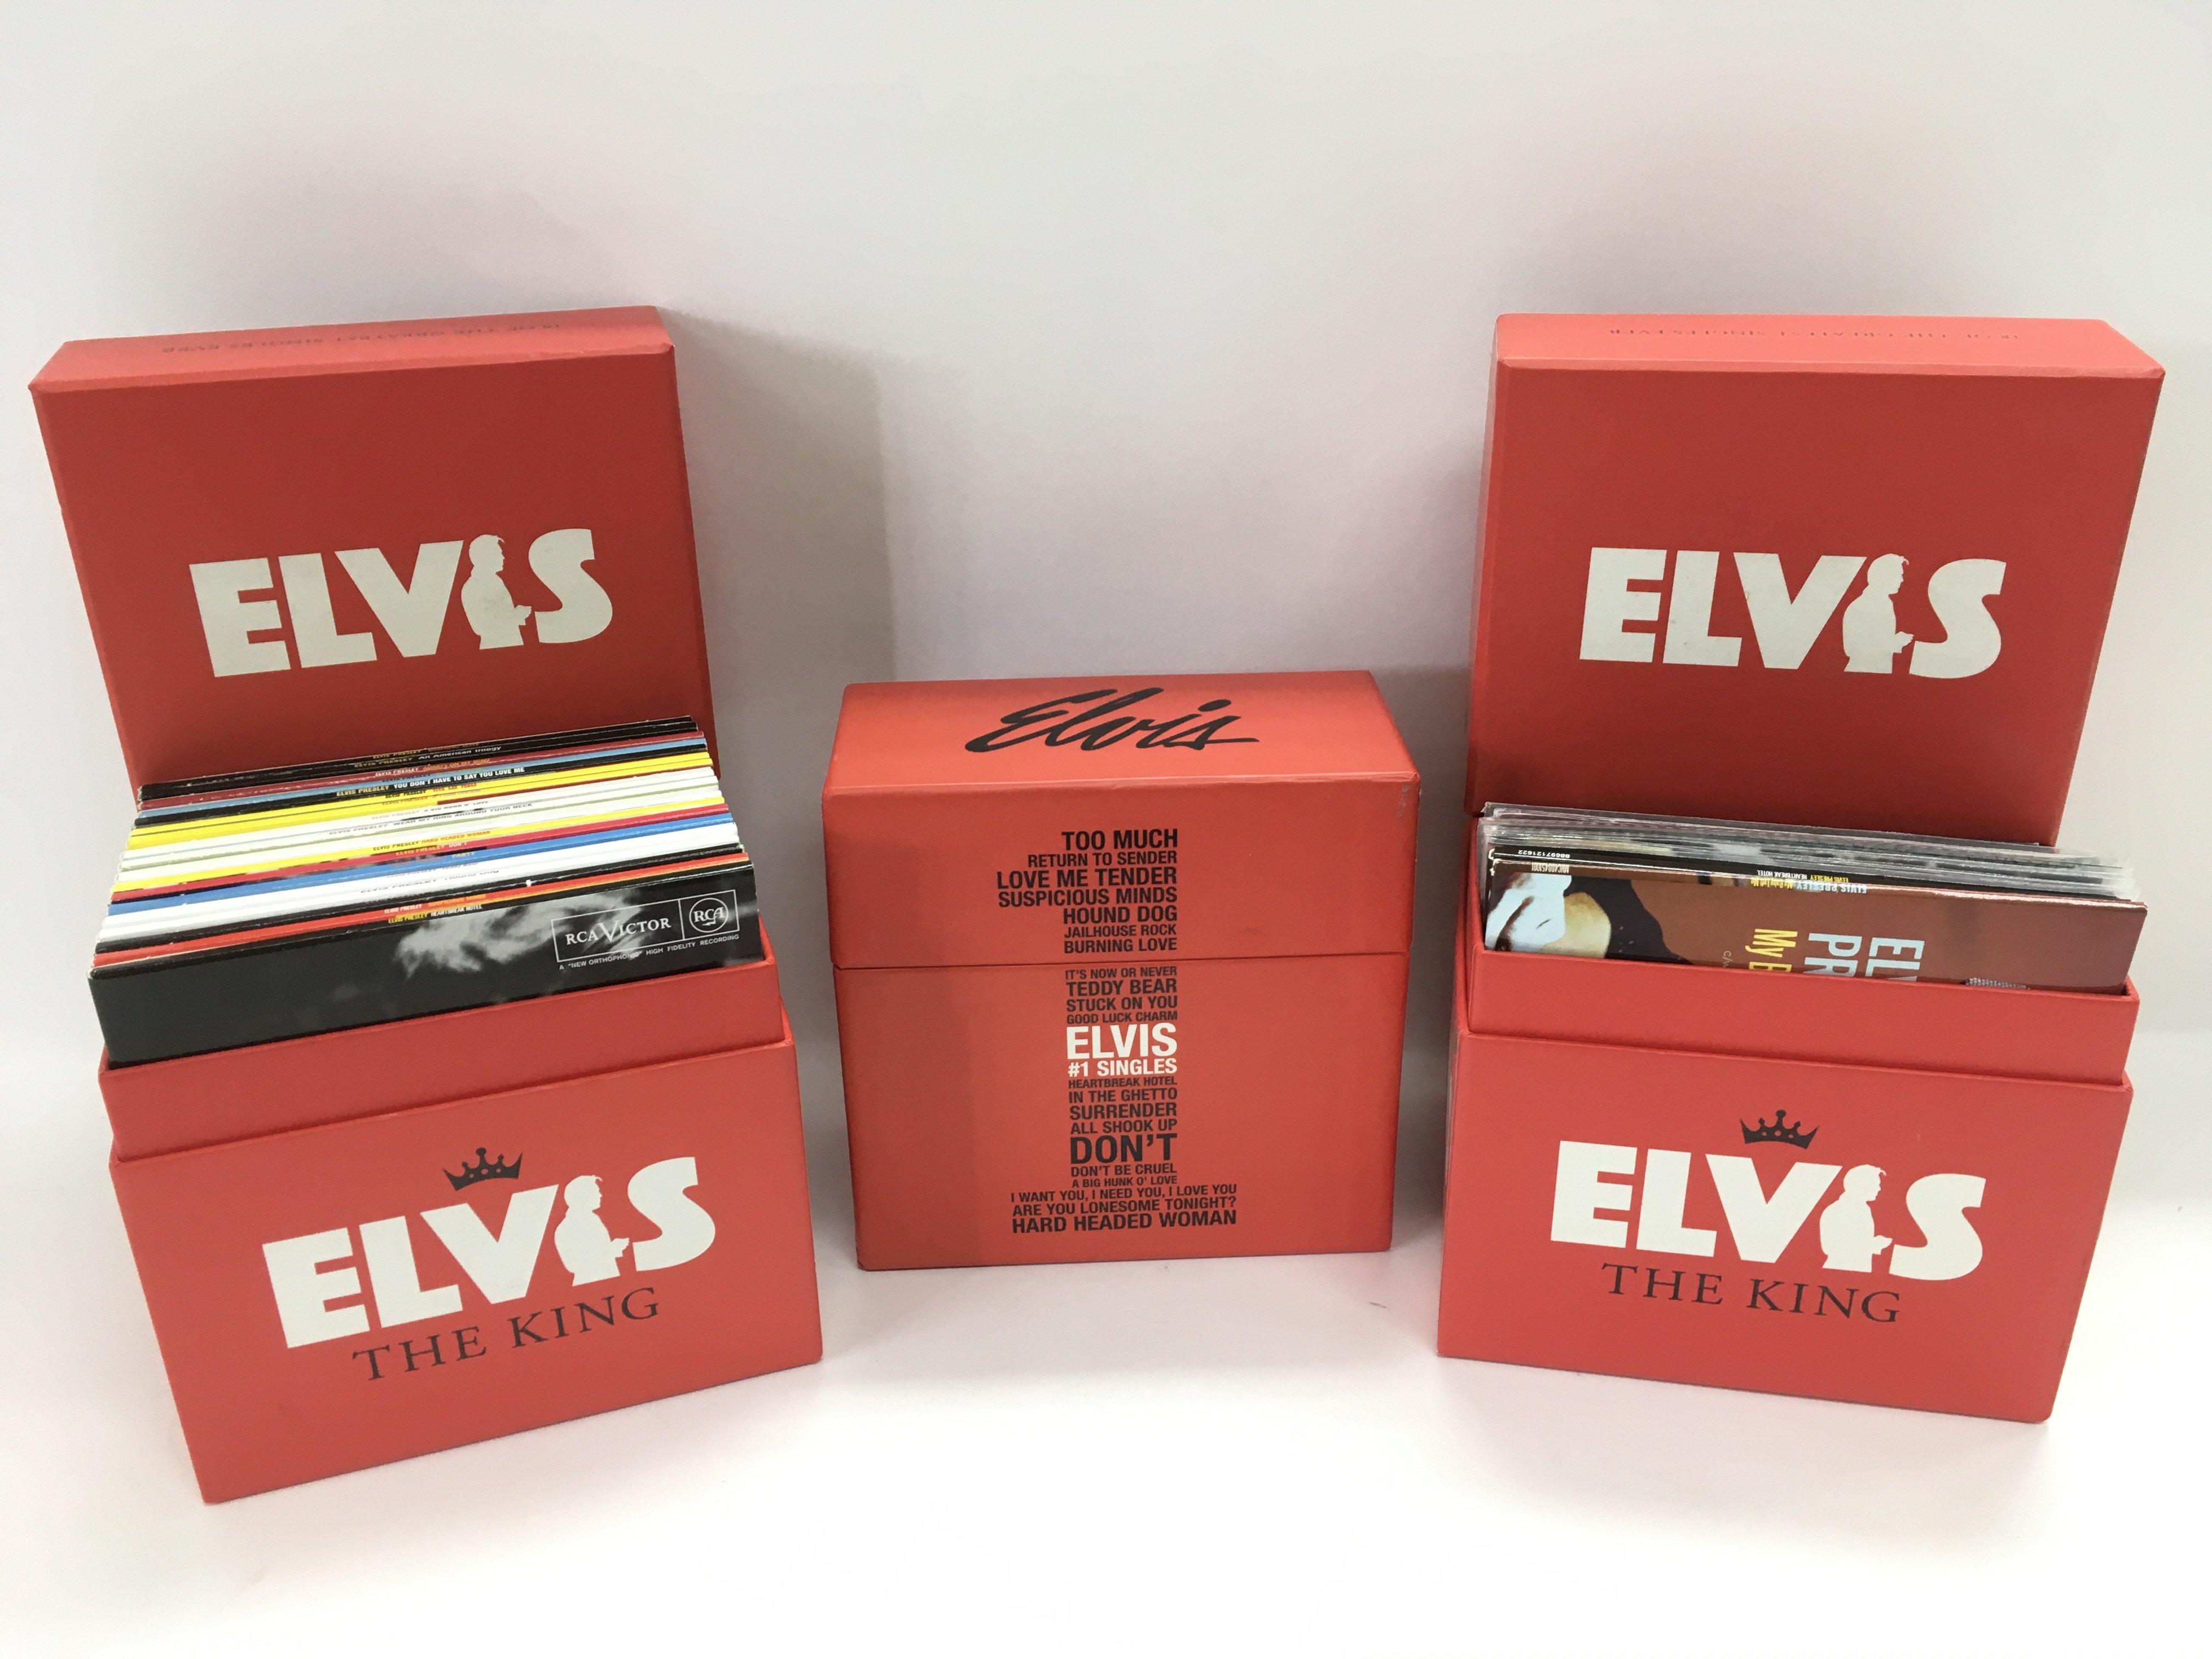 Three Elvis Presley CD box sets, one incomplete.